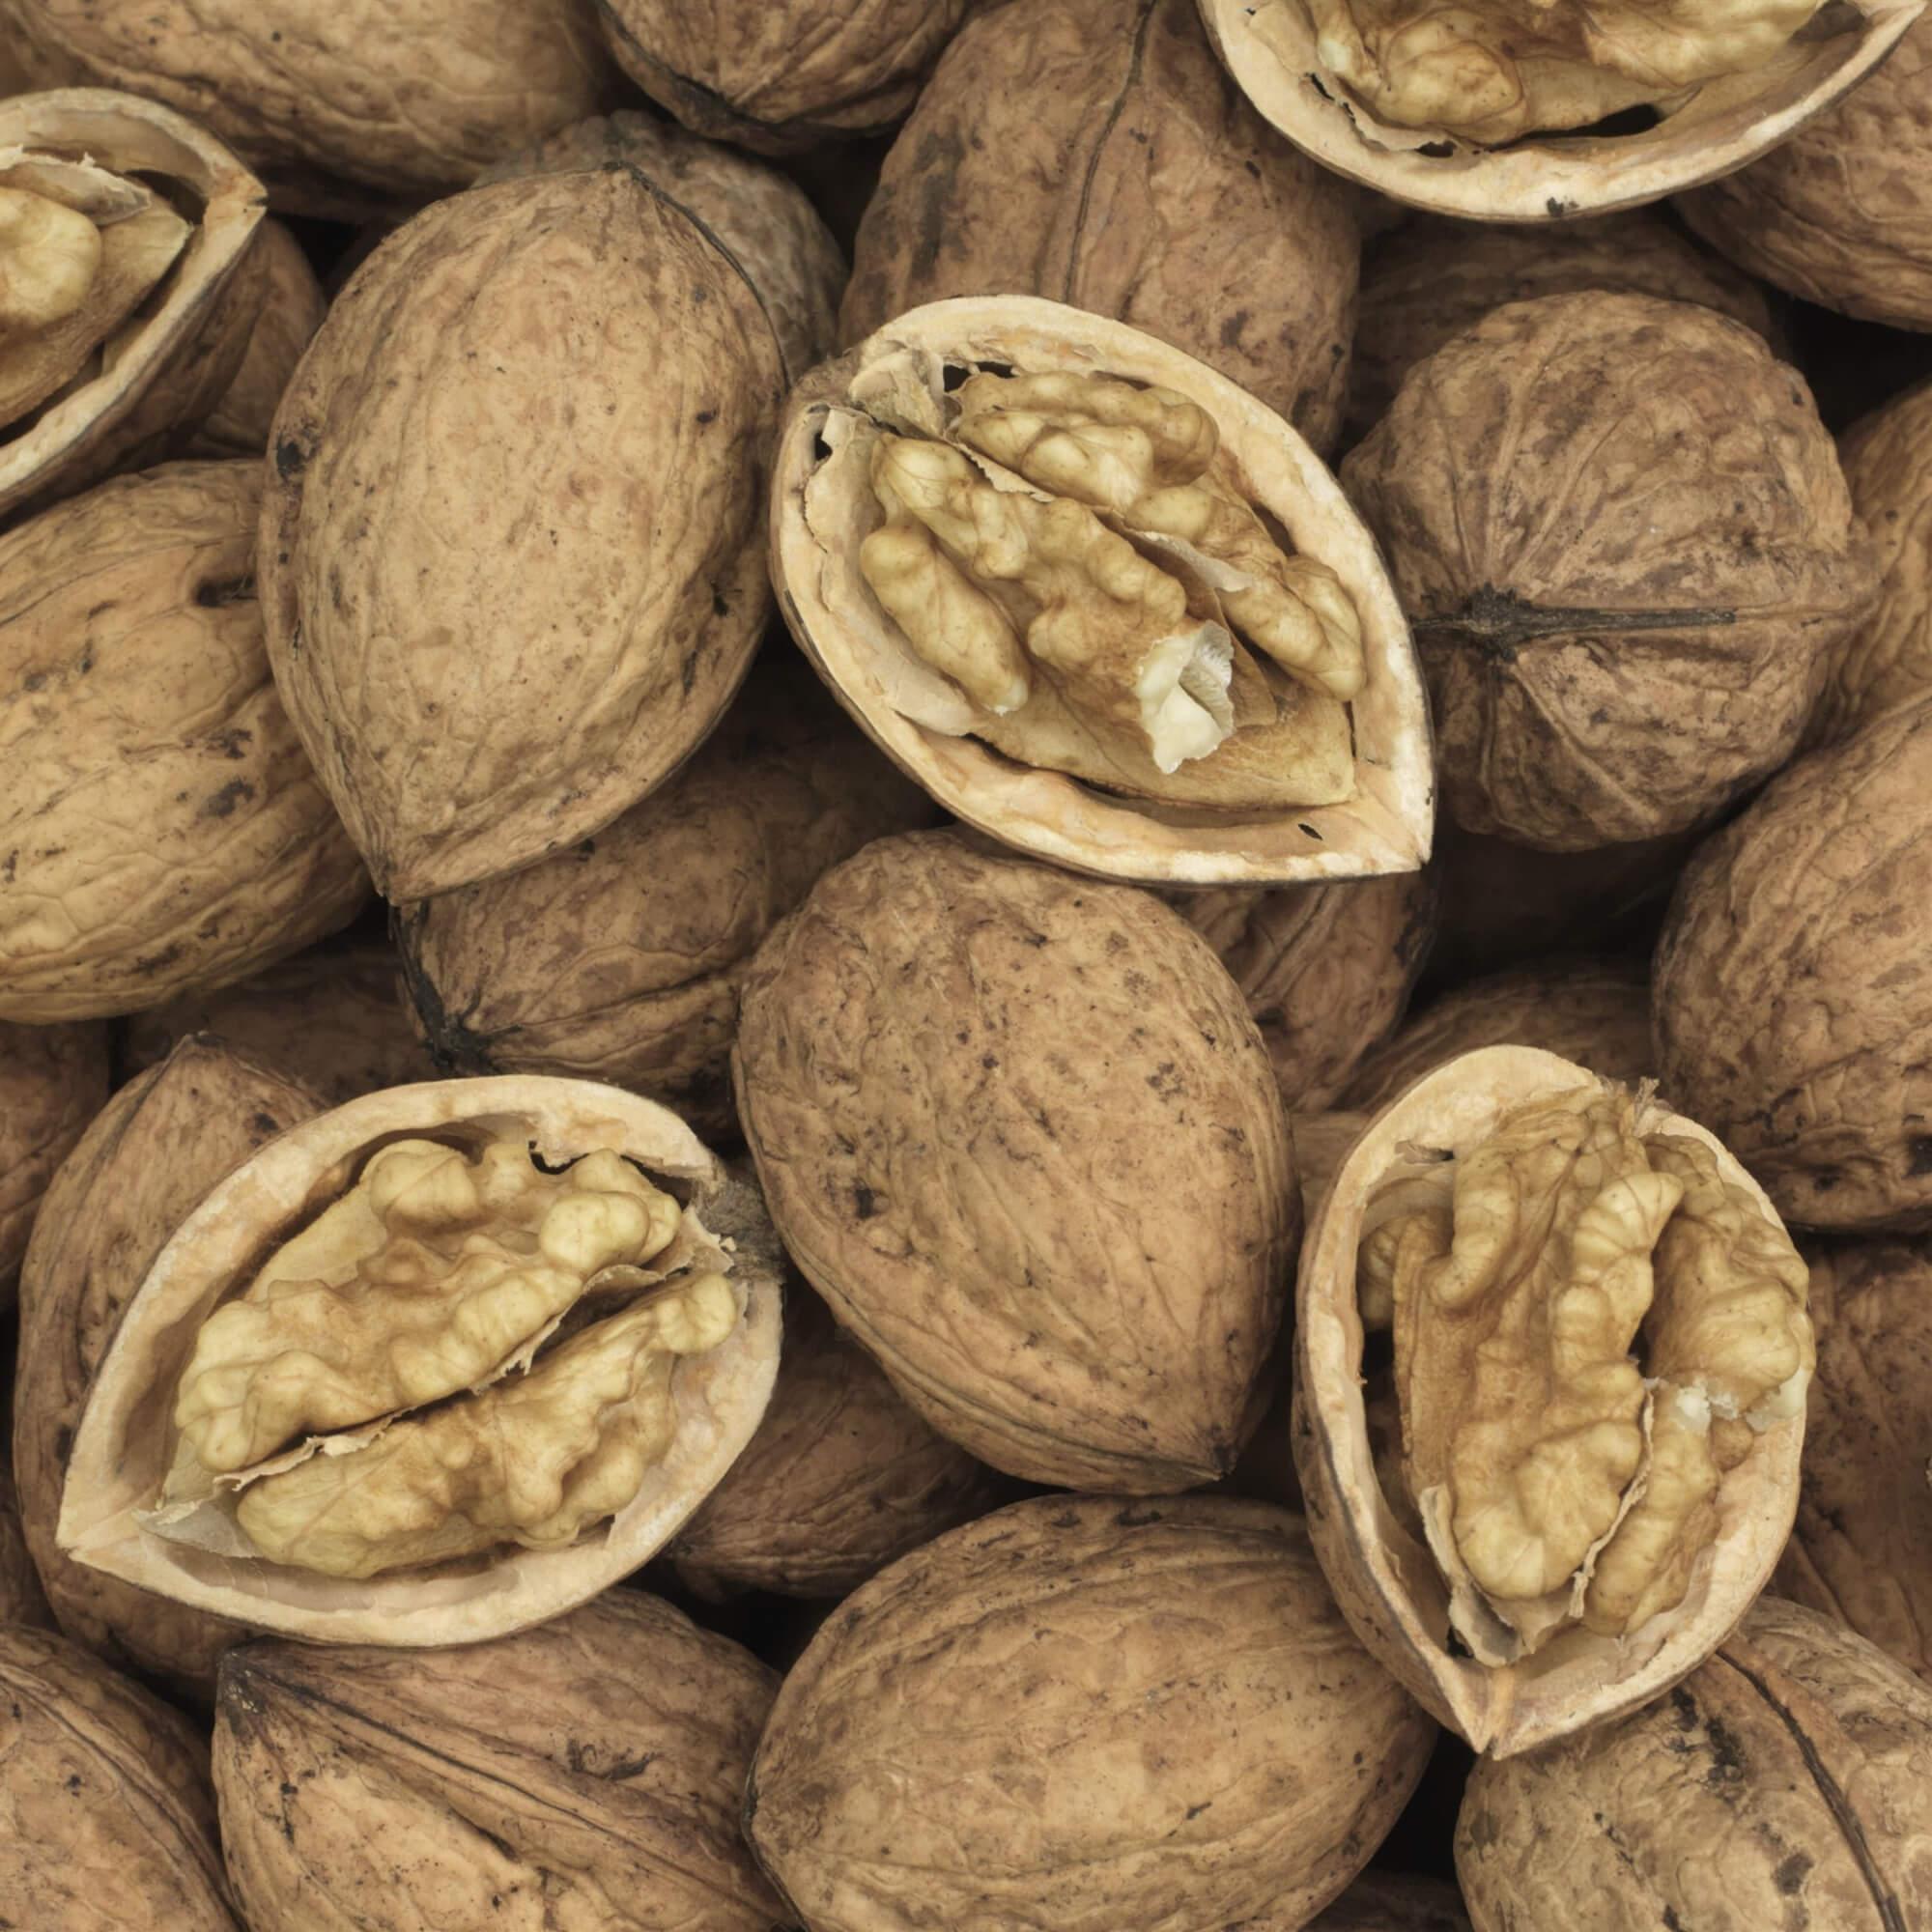 The Walnut Tree Company | Walnut Fruit Trees | Walnut Timber